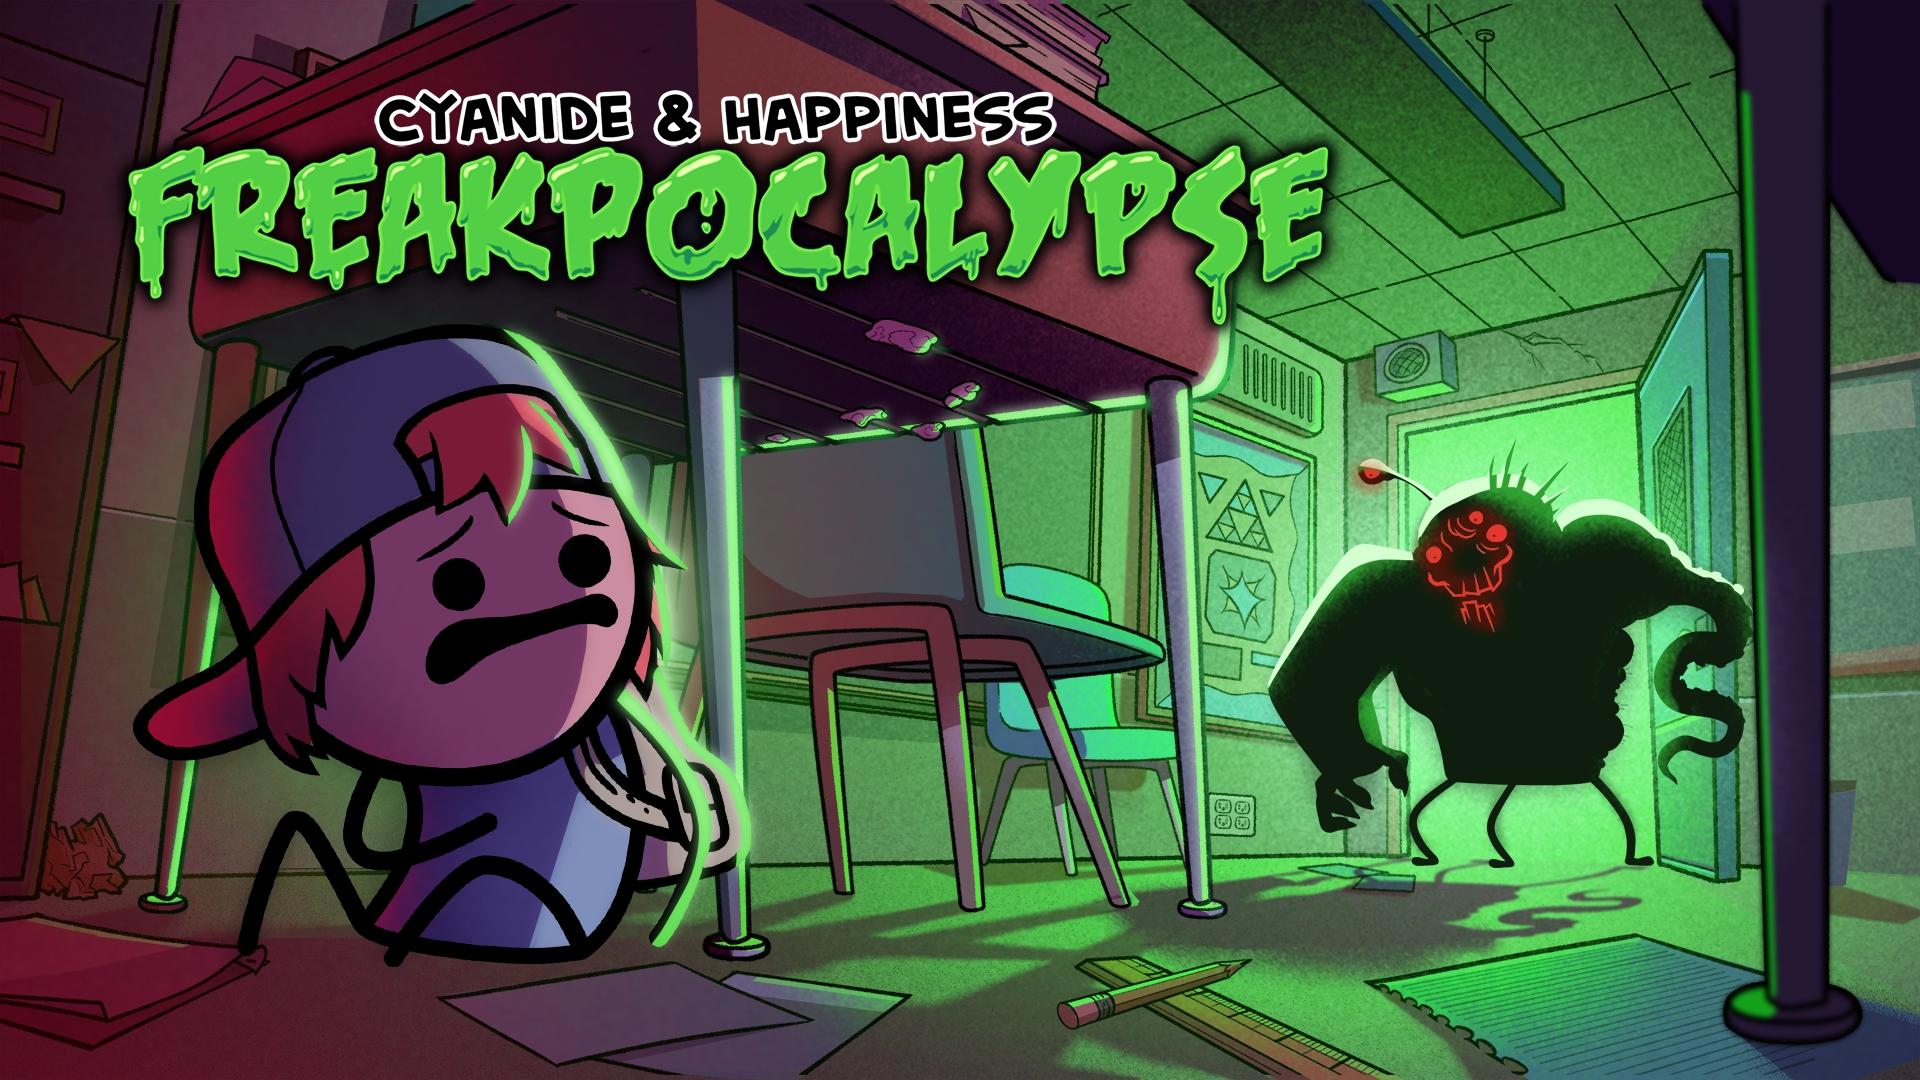 Nintendo Download: Take a Crash Course in Apocalypse 101